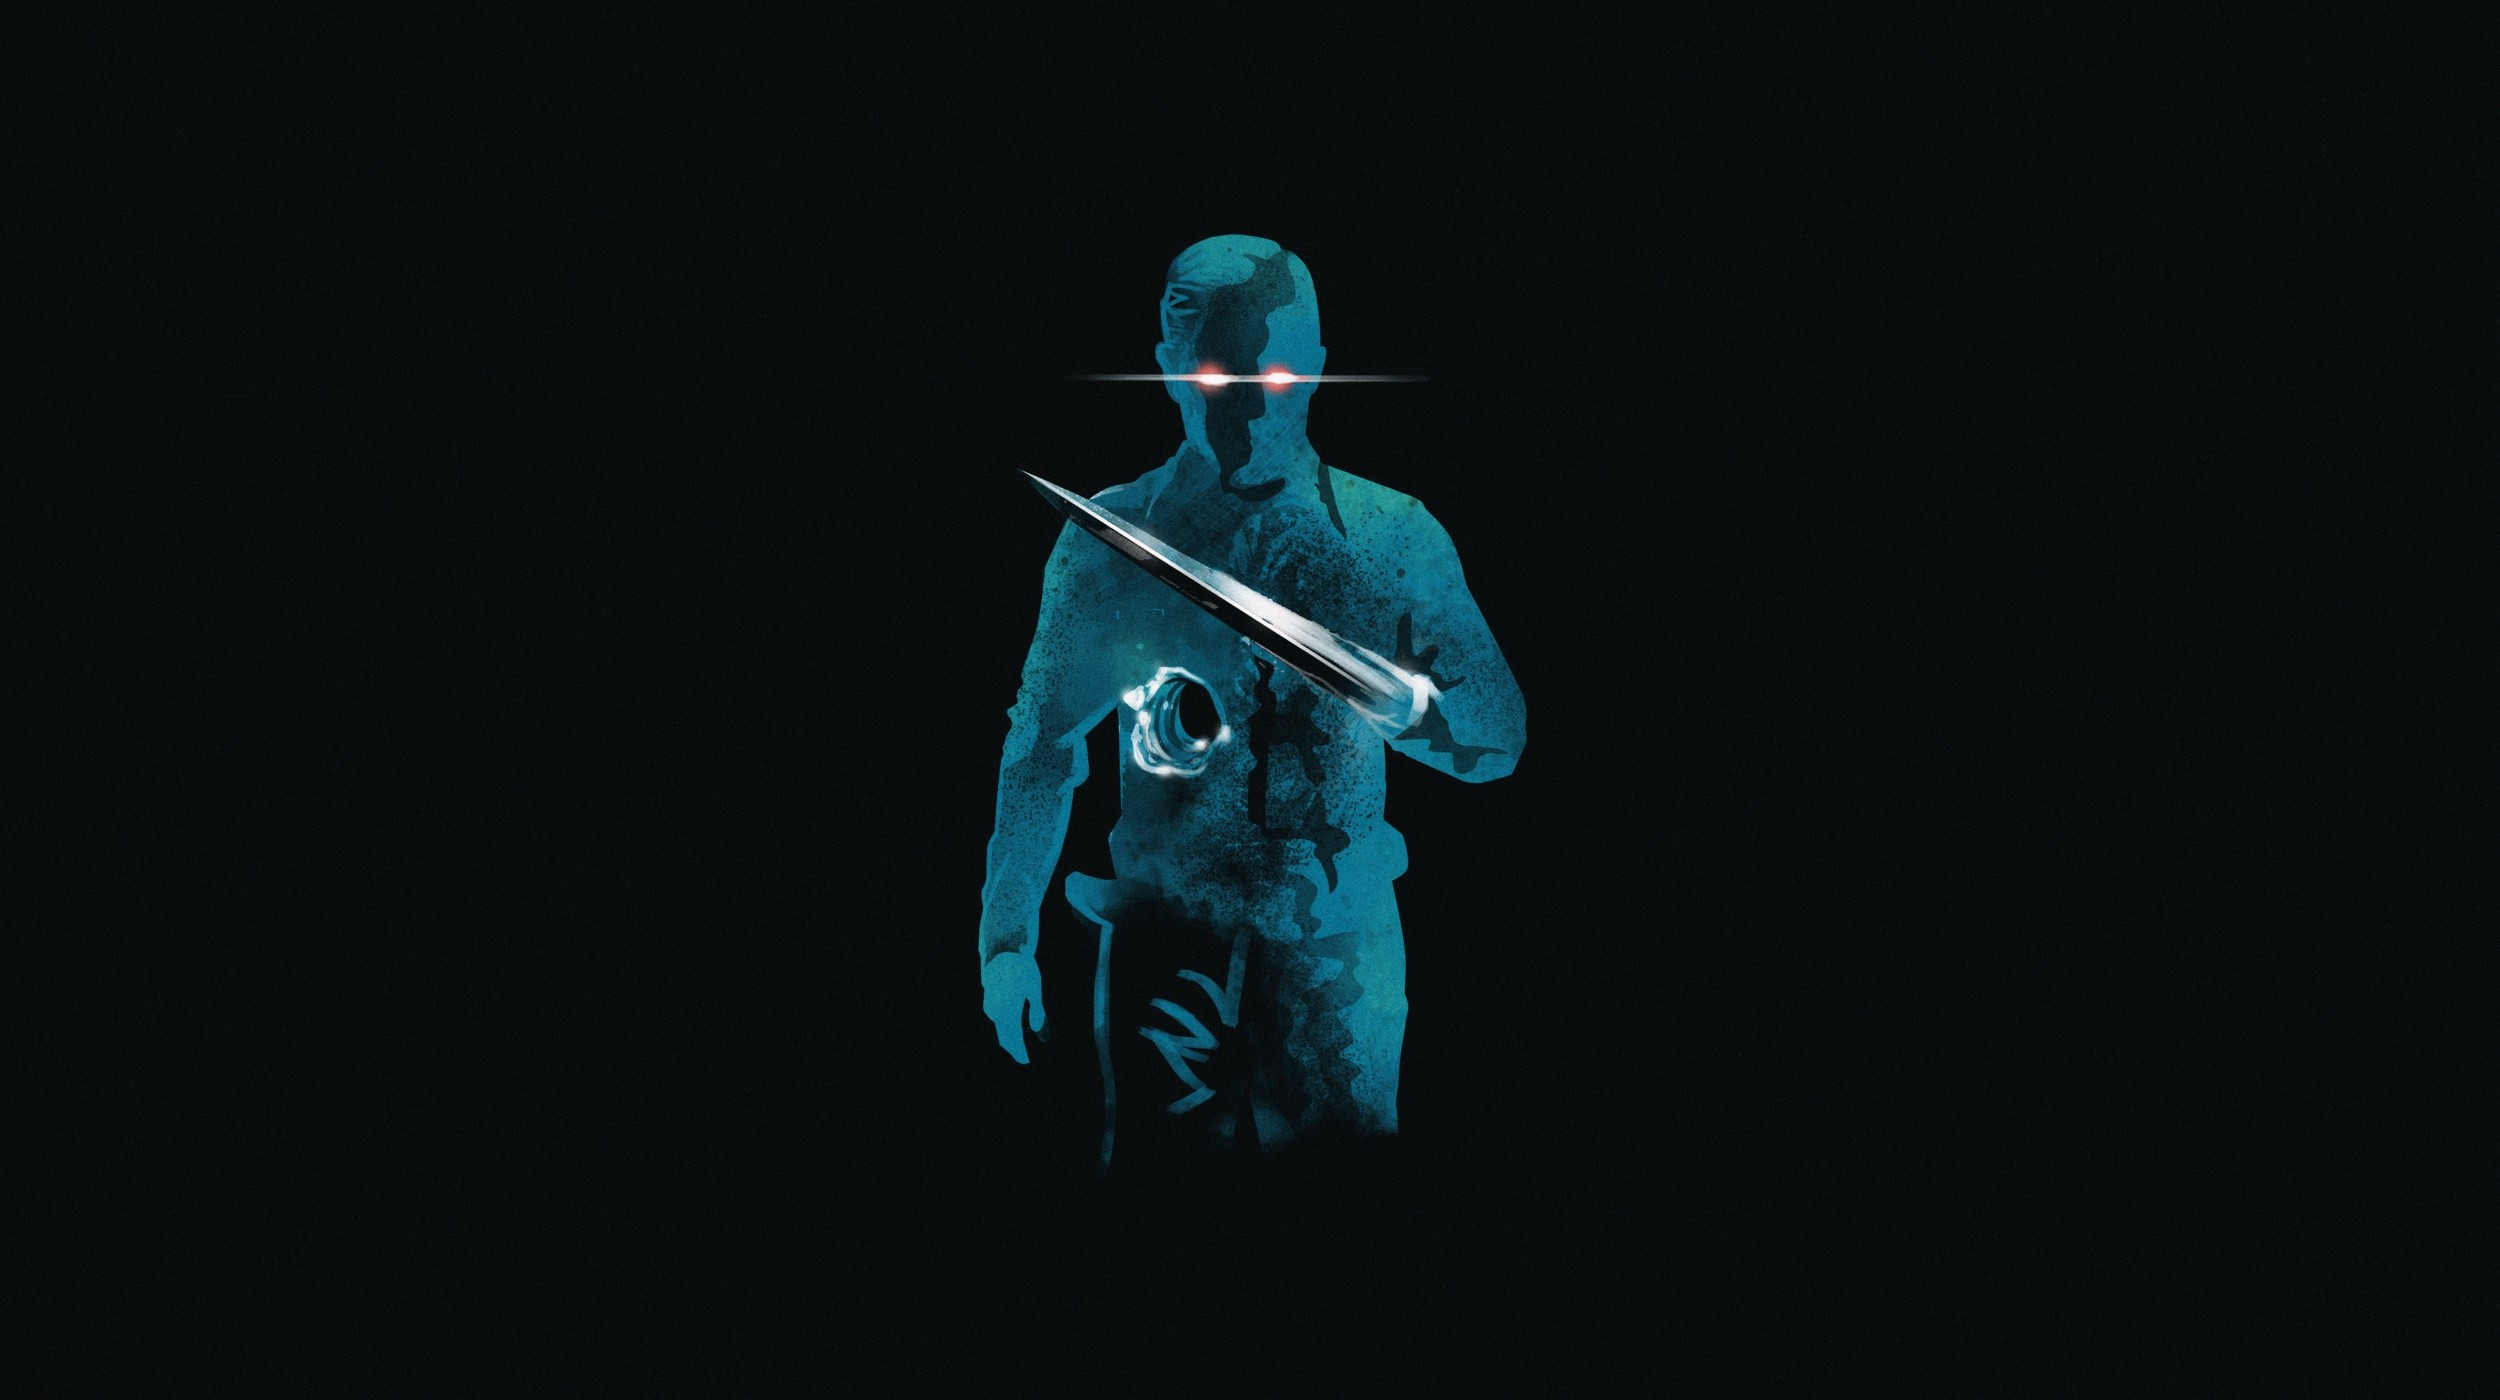 Res: 2500x1400, General  Terminator movies artwork T-1000 blue black background Terminator  2